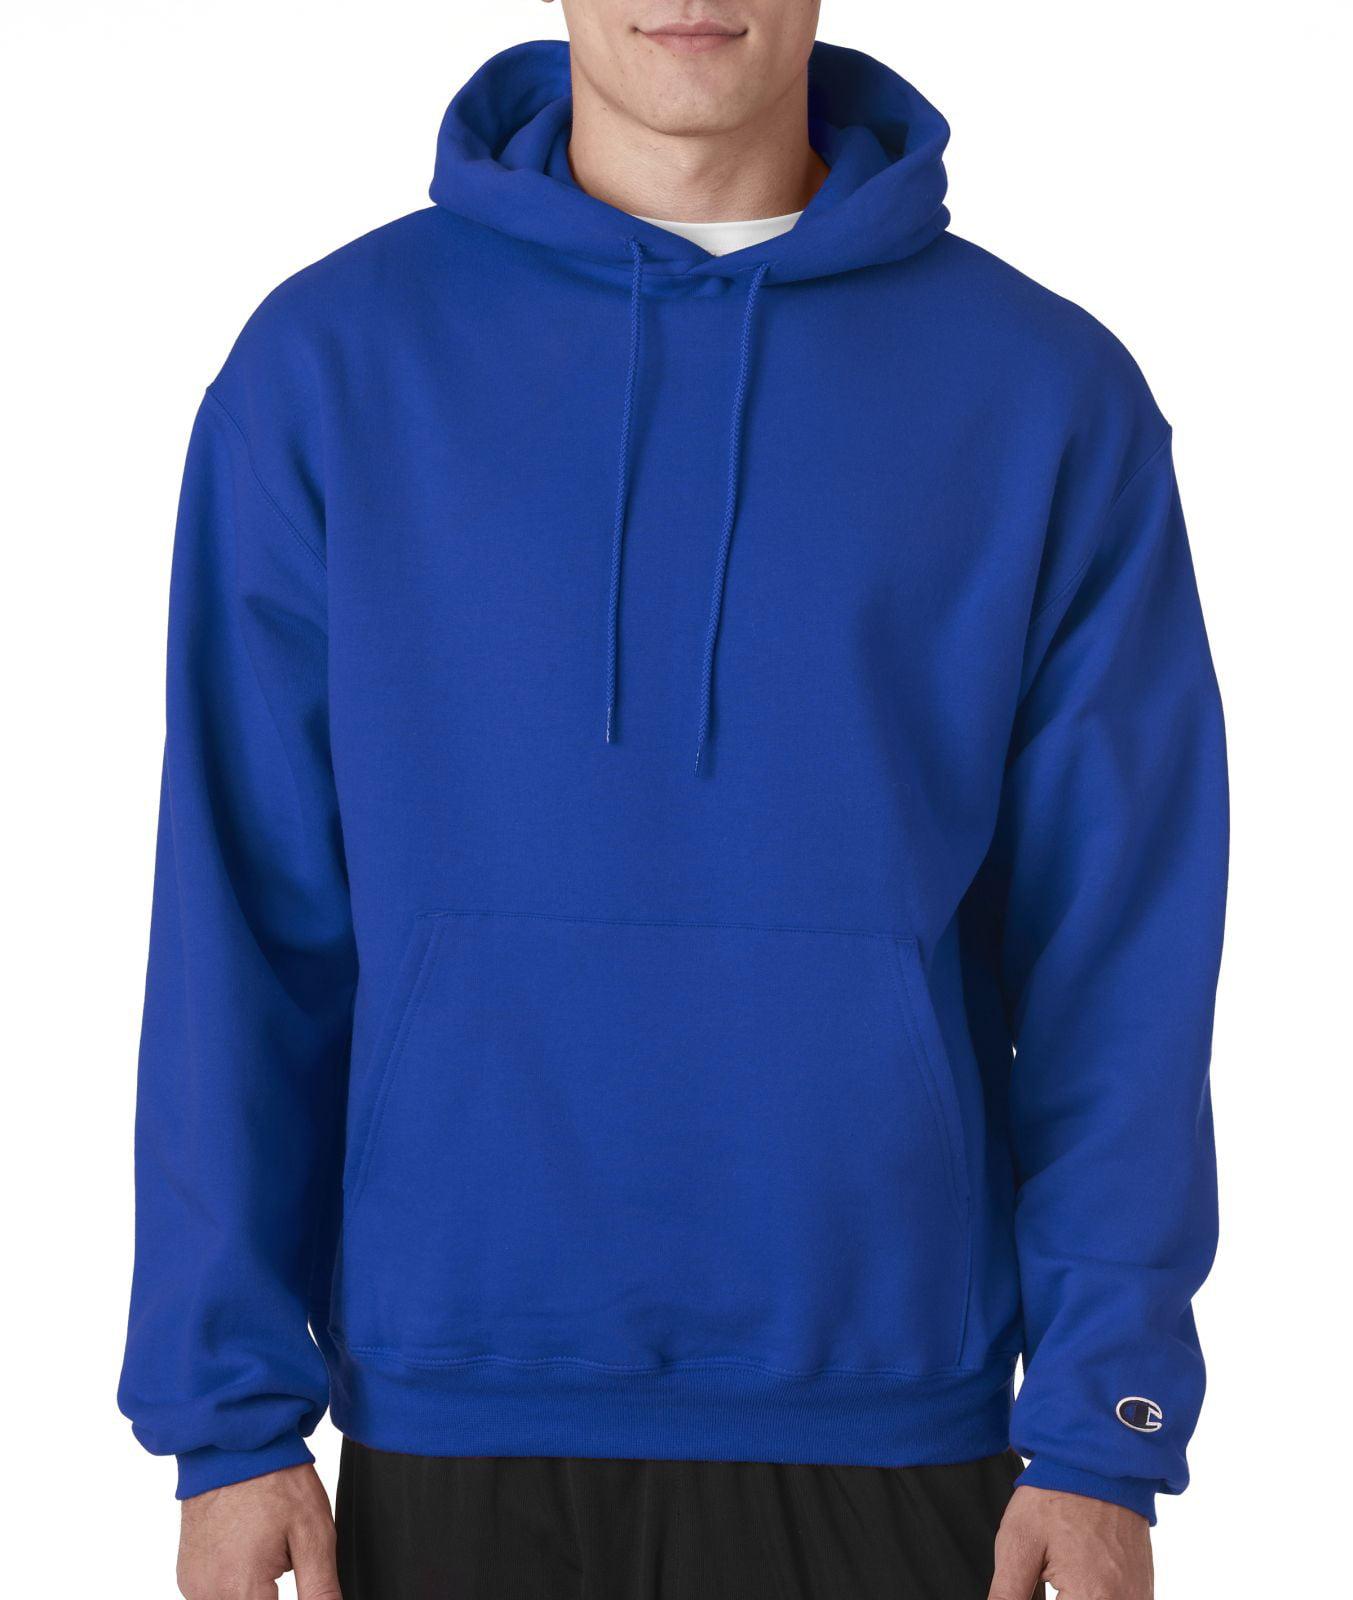 Champion S700 Hoodie Sweatshirt 9 oz. EcoSmart Pullover - Walmart.com